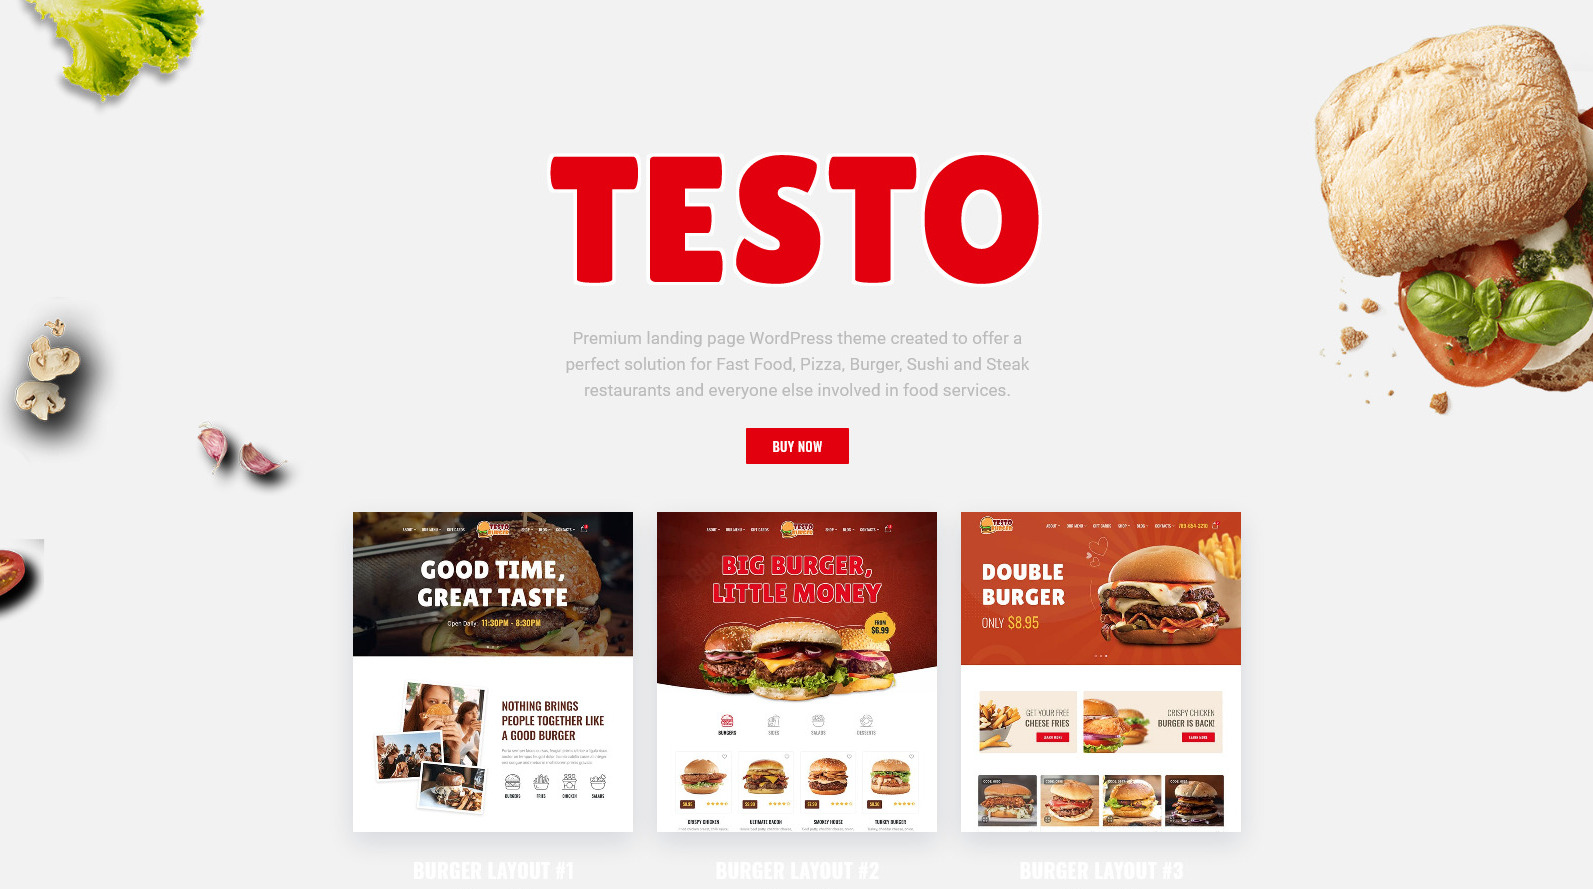 Testo Pizza and Fast Food WordPress Theme